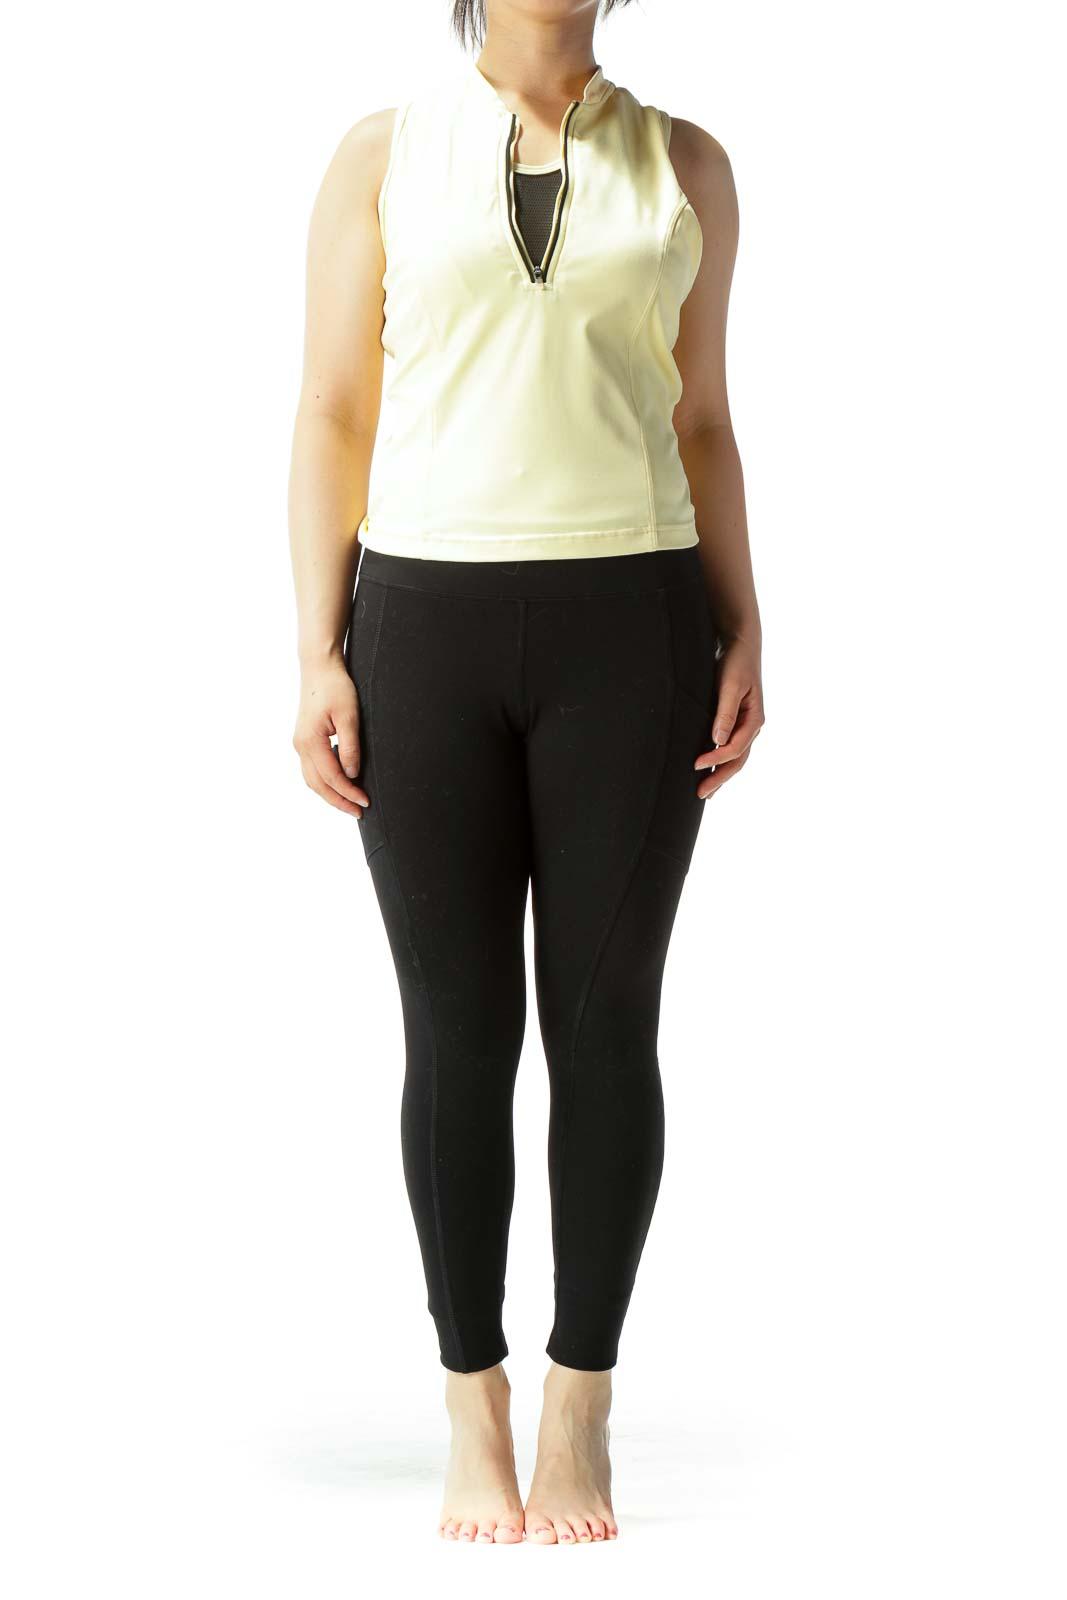 Light Yellow Black Zippered Built-In Mesh Bra Sleeveless Sports Top